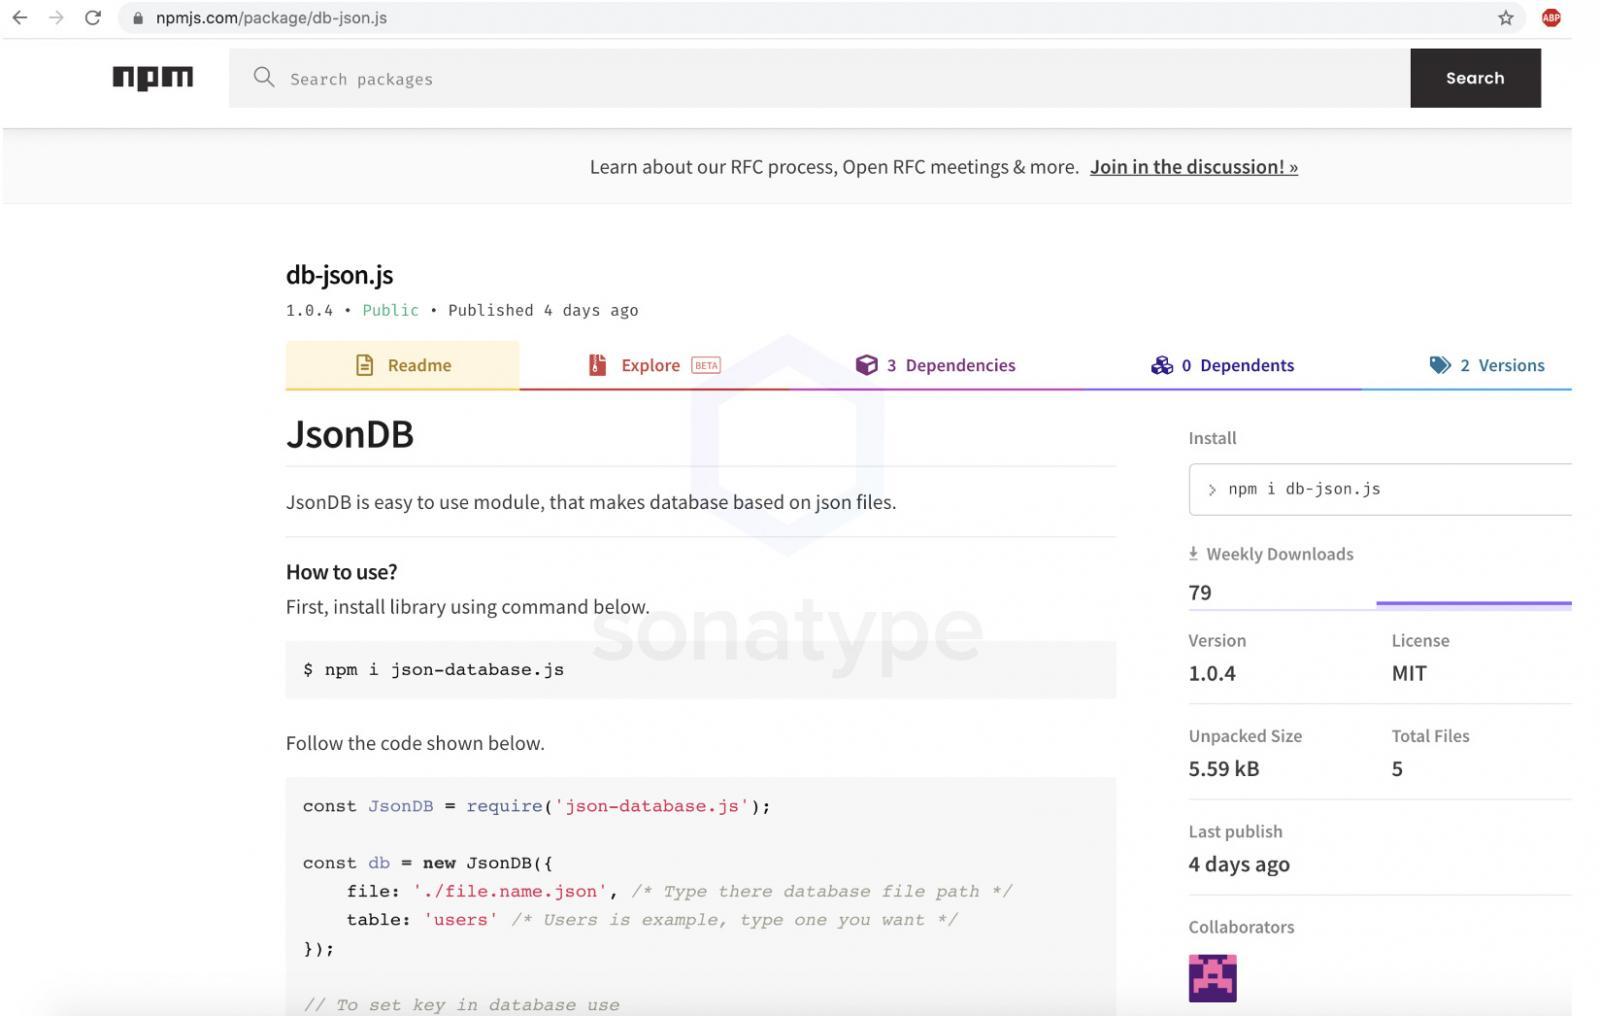 NPM上的JsonDB(db-json.js)软件包